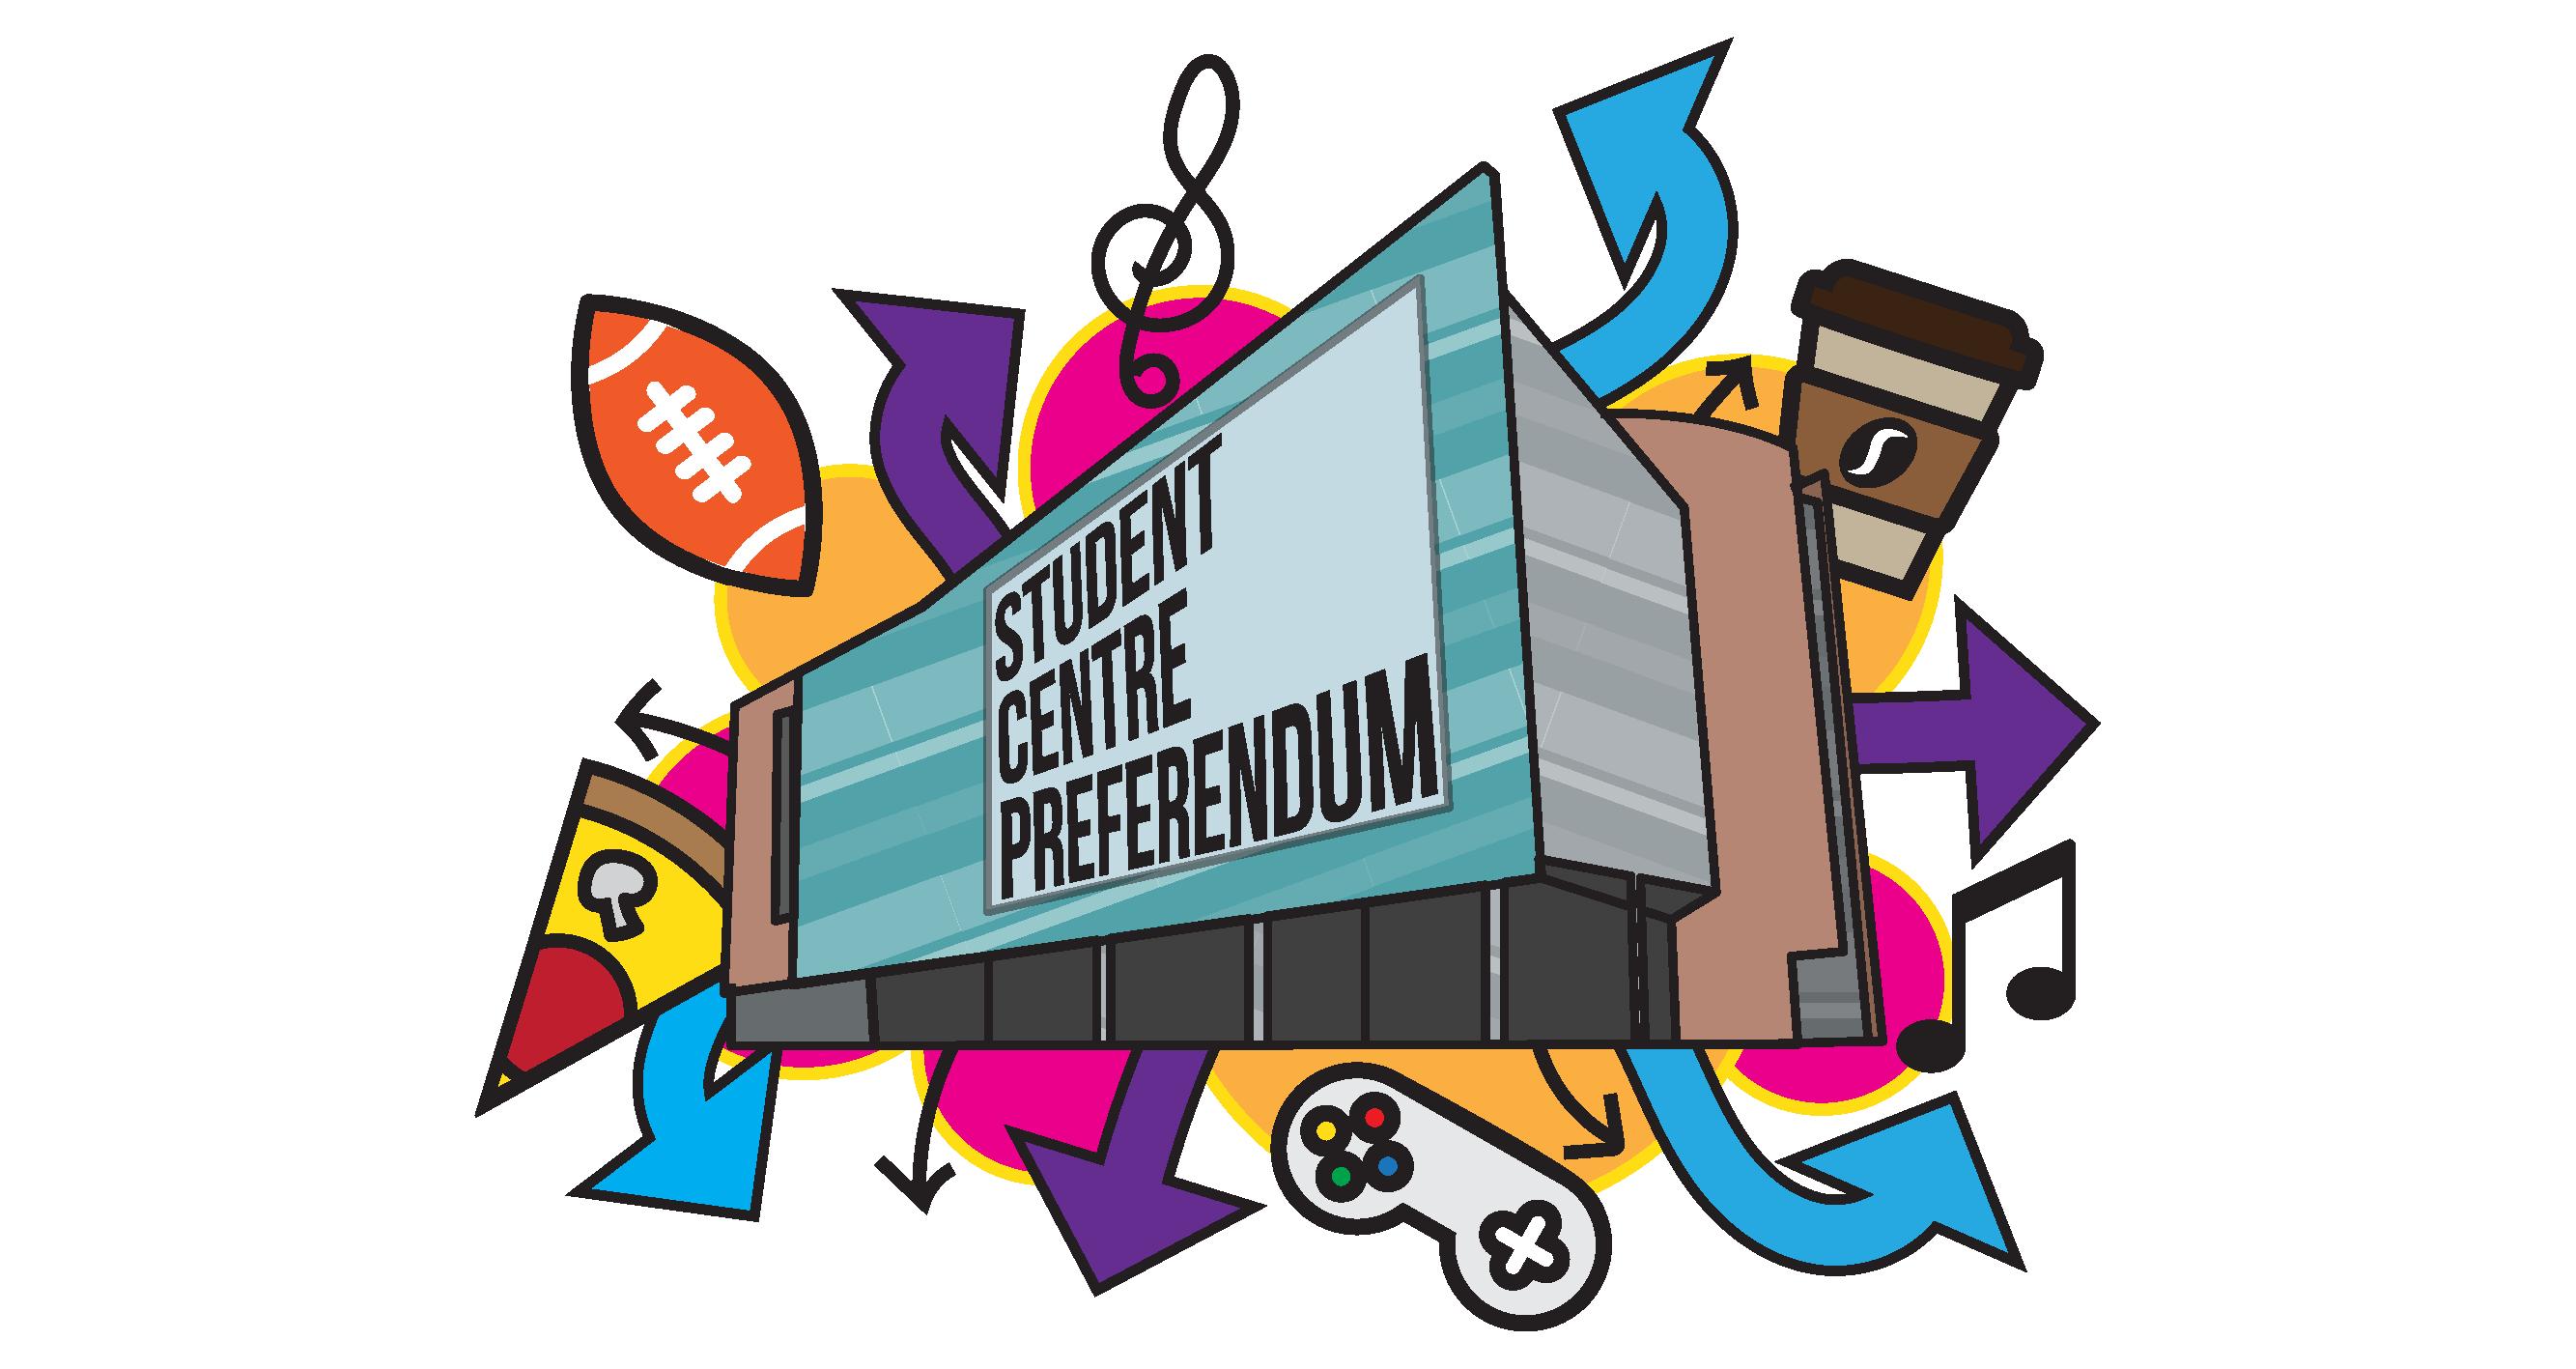 Student Centre Preferendum